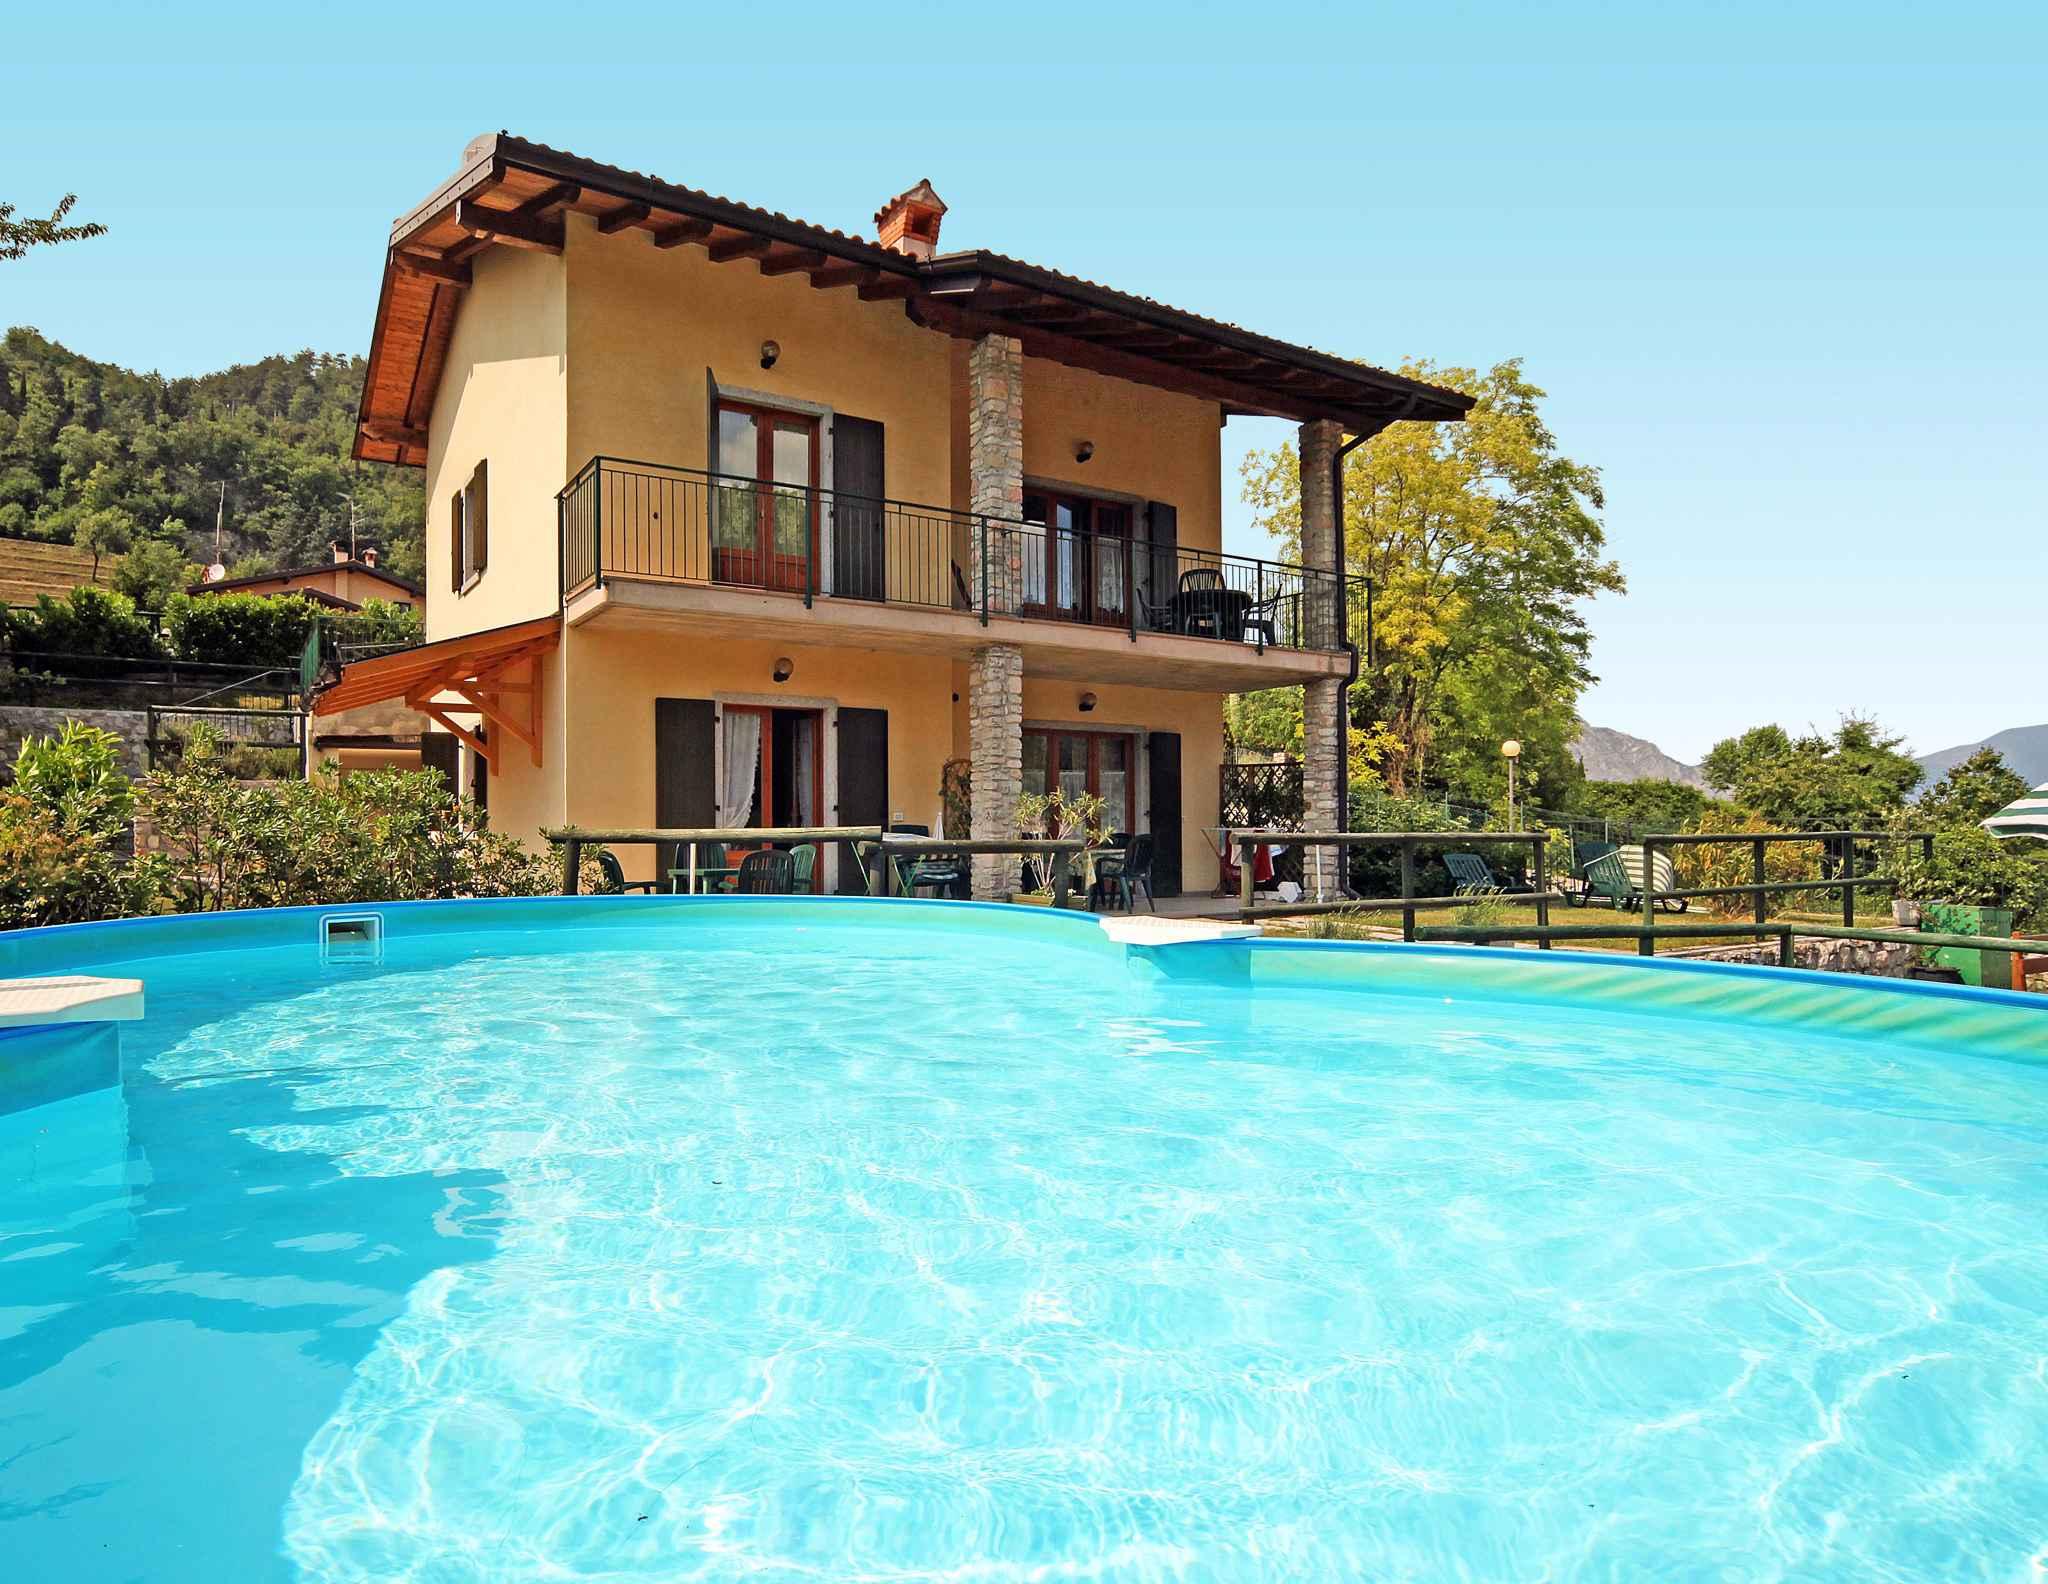 Ferienwohnung Ferienanlage Casa Susy   Gardasee - Lago di Garda